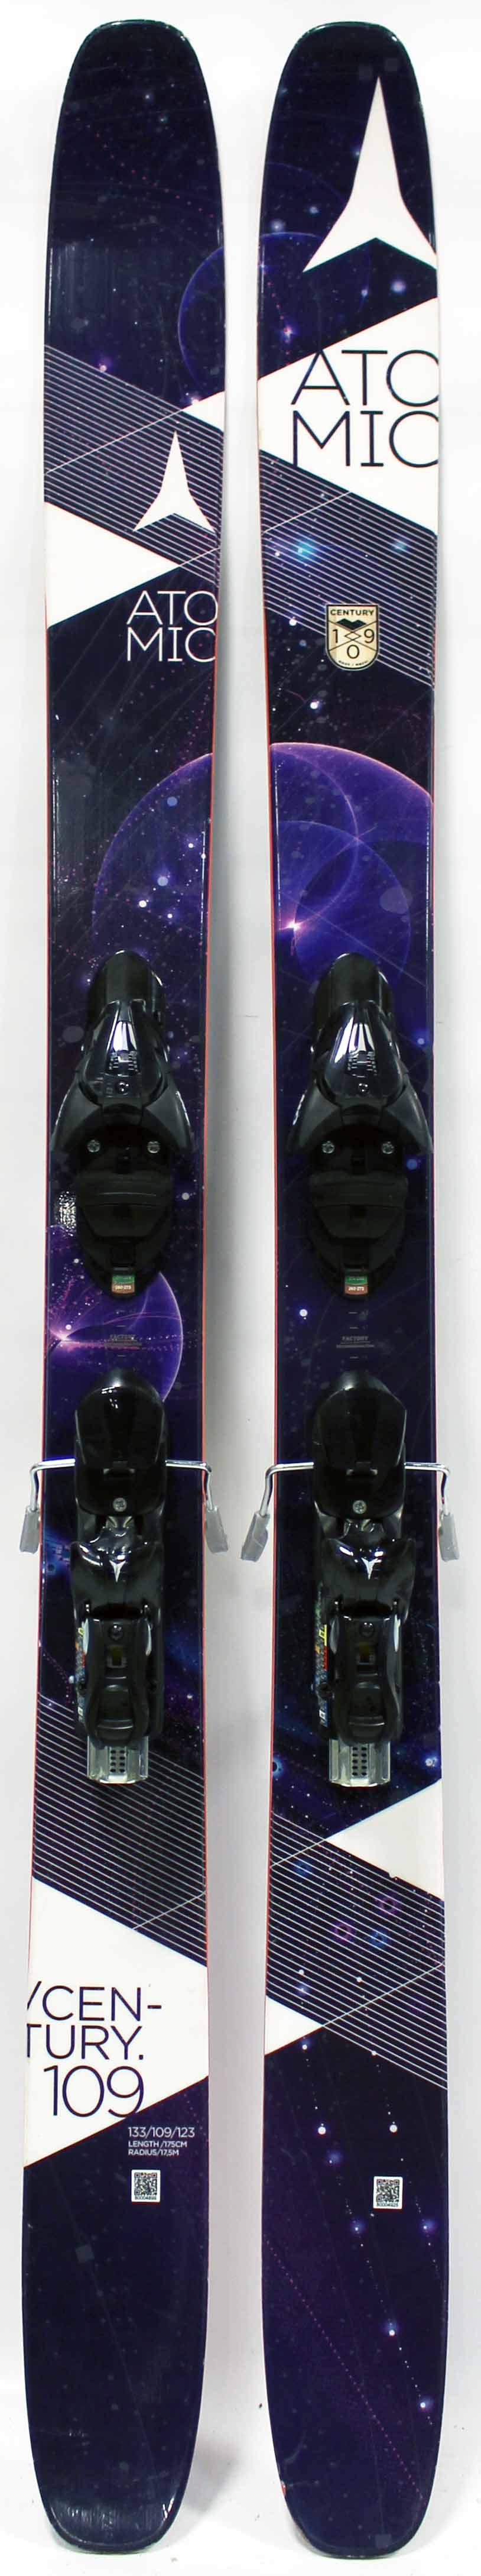 2016 Atomic Century 109 Used Demo 175cm Skis And Bindings